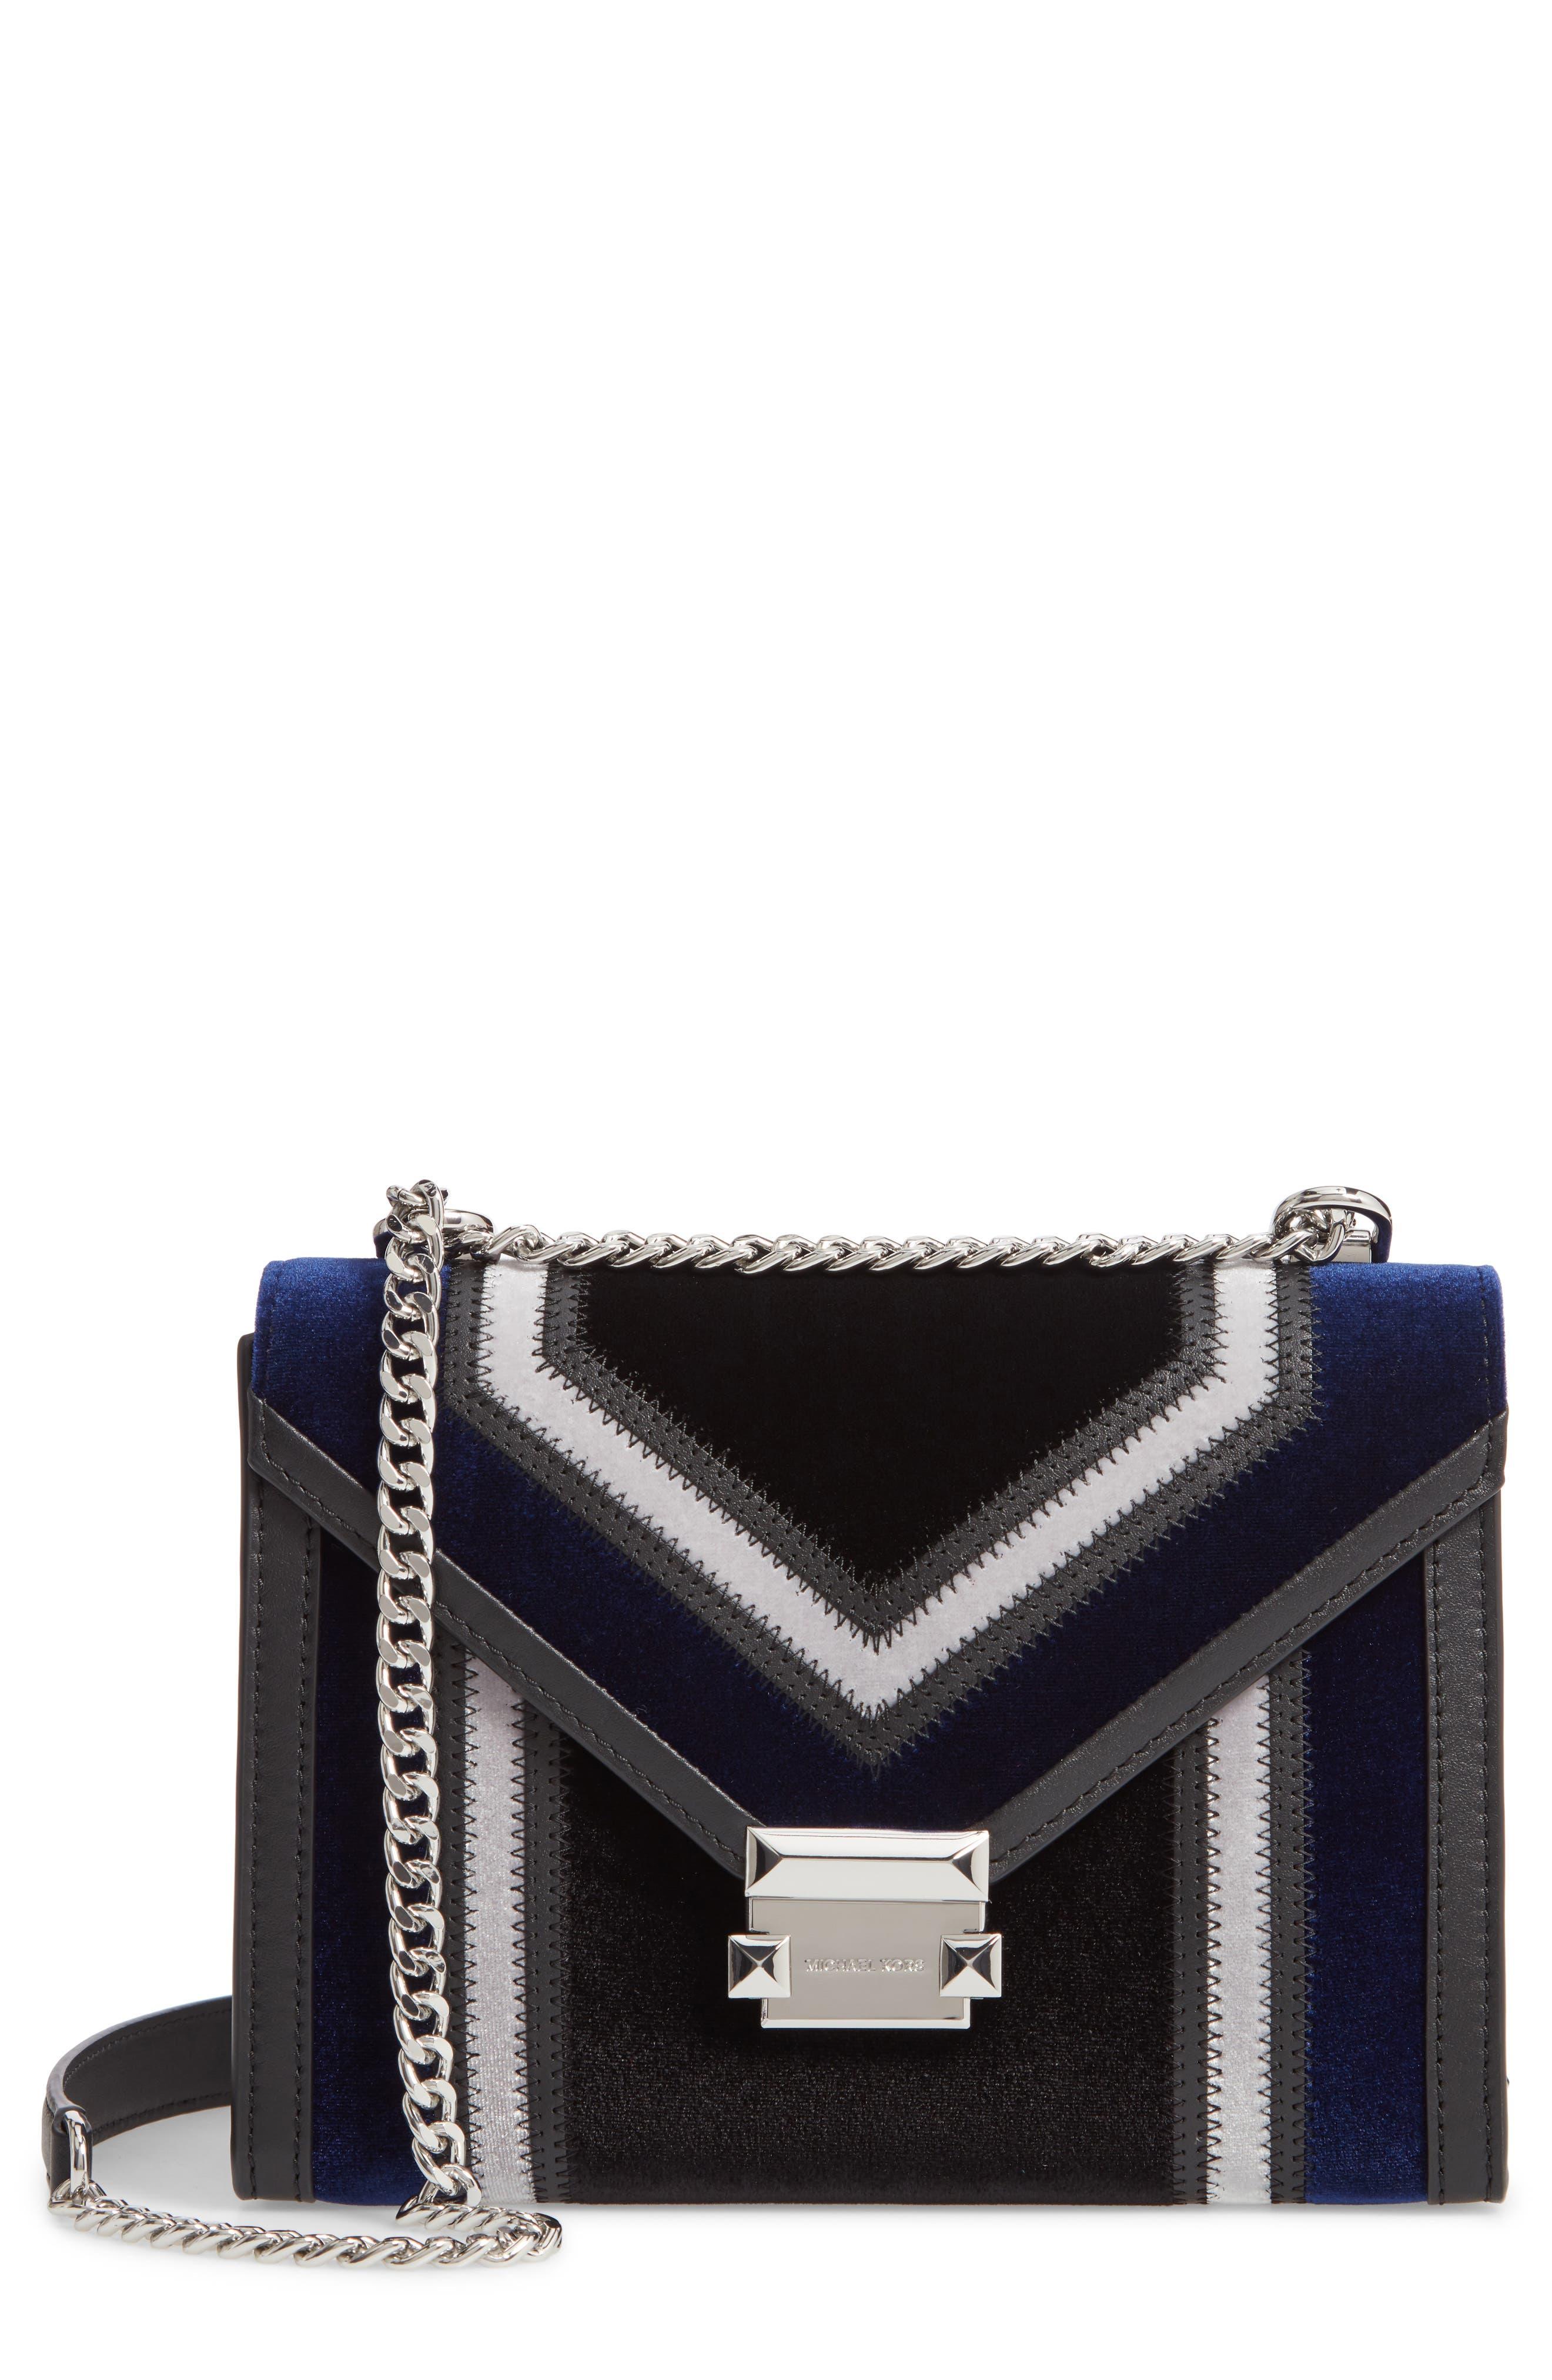 Large Velvet Shoulder Bag,                             Main thumbnail 1, color,                             BLACK/ DARK BLUE